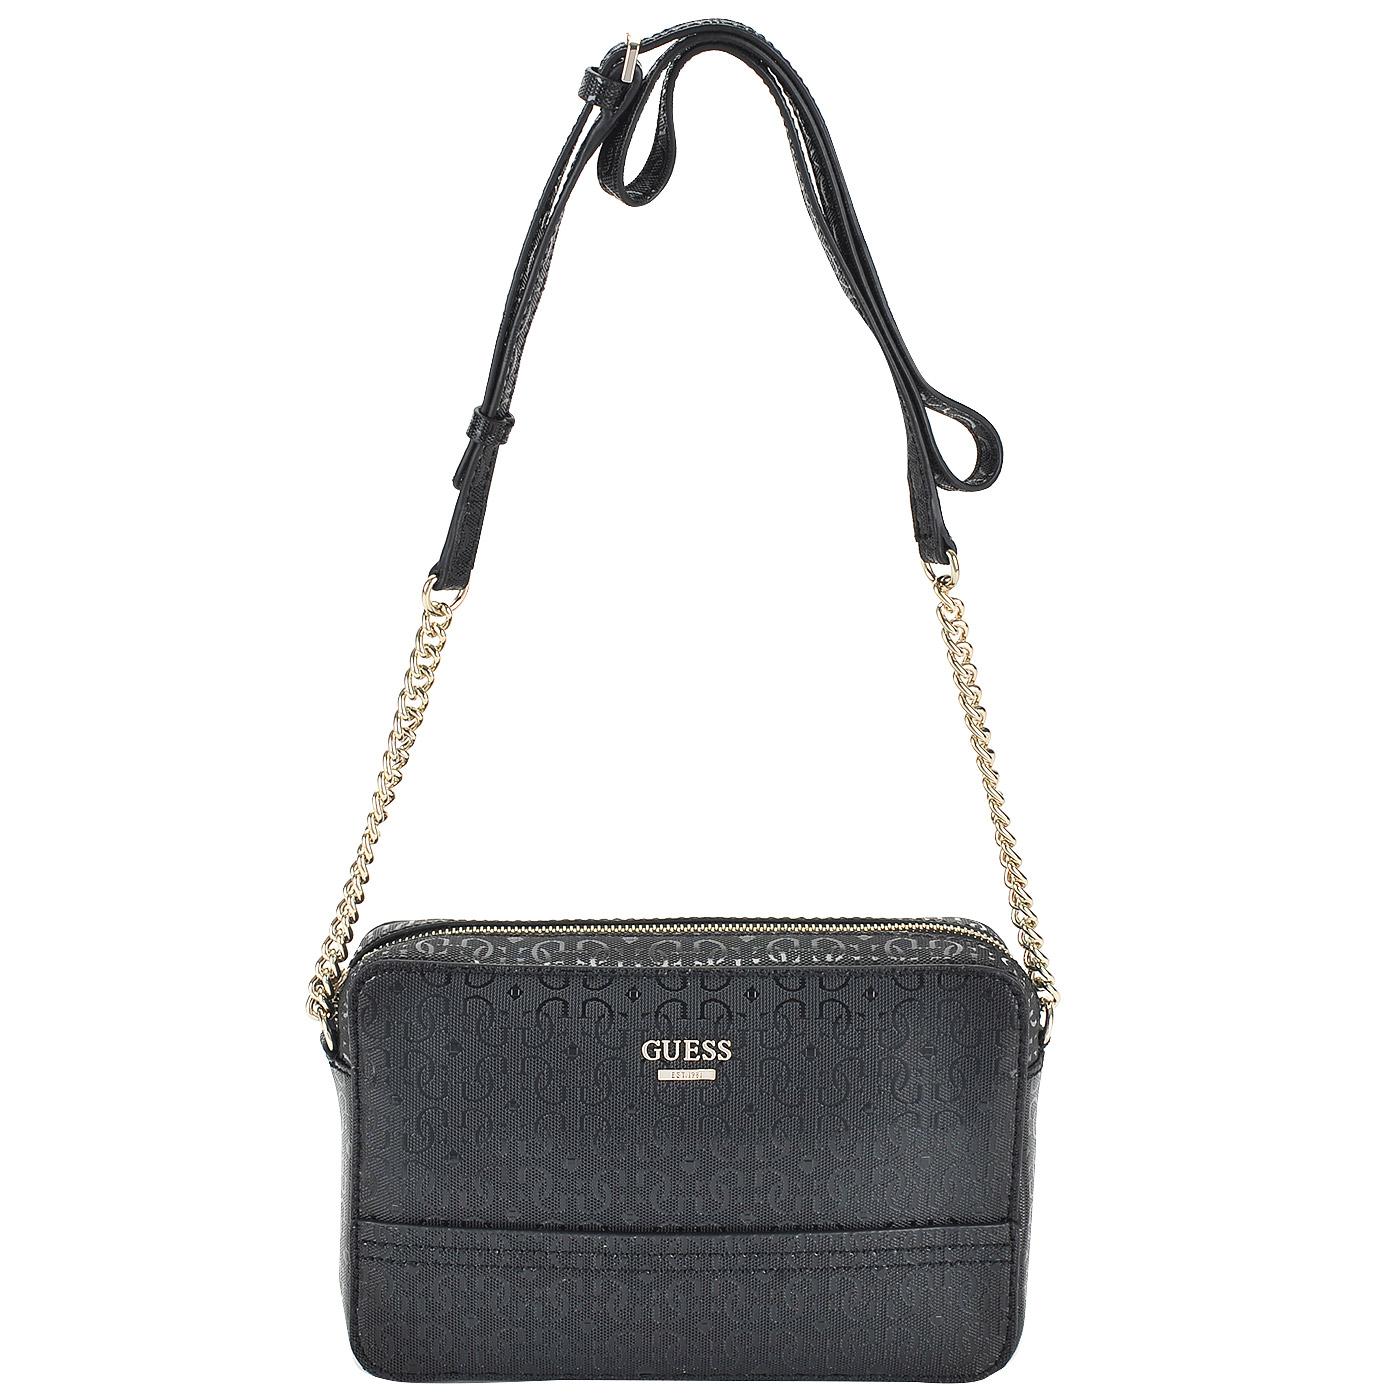 800b0d631dcb Женская черная сумка через плечо Guess Devyn HWGS64 21120_black ...